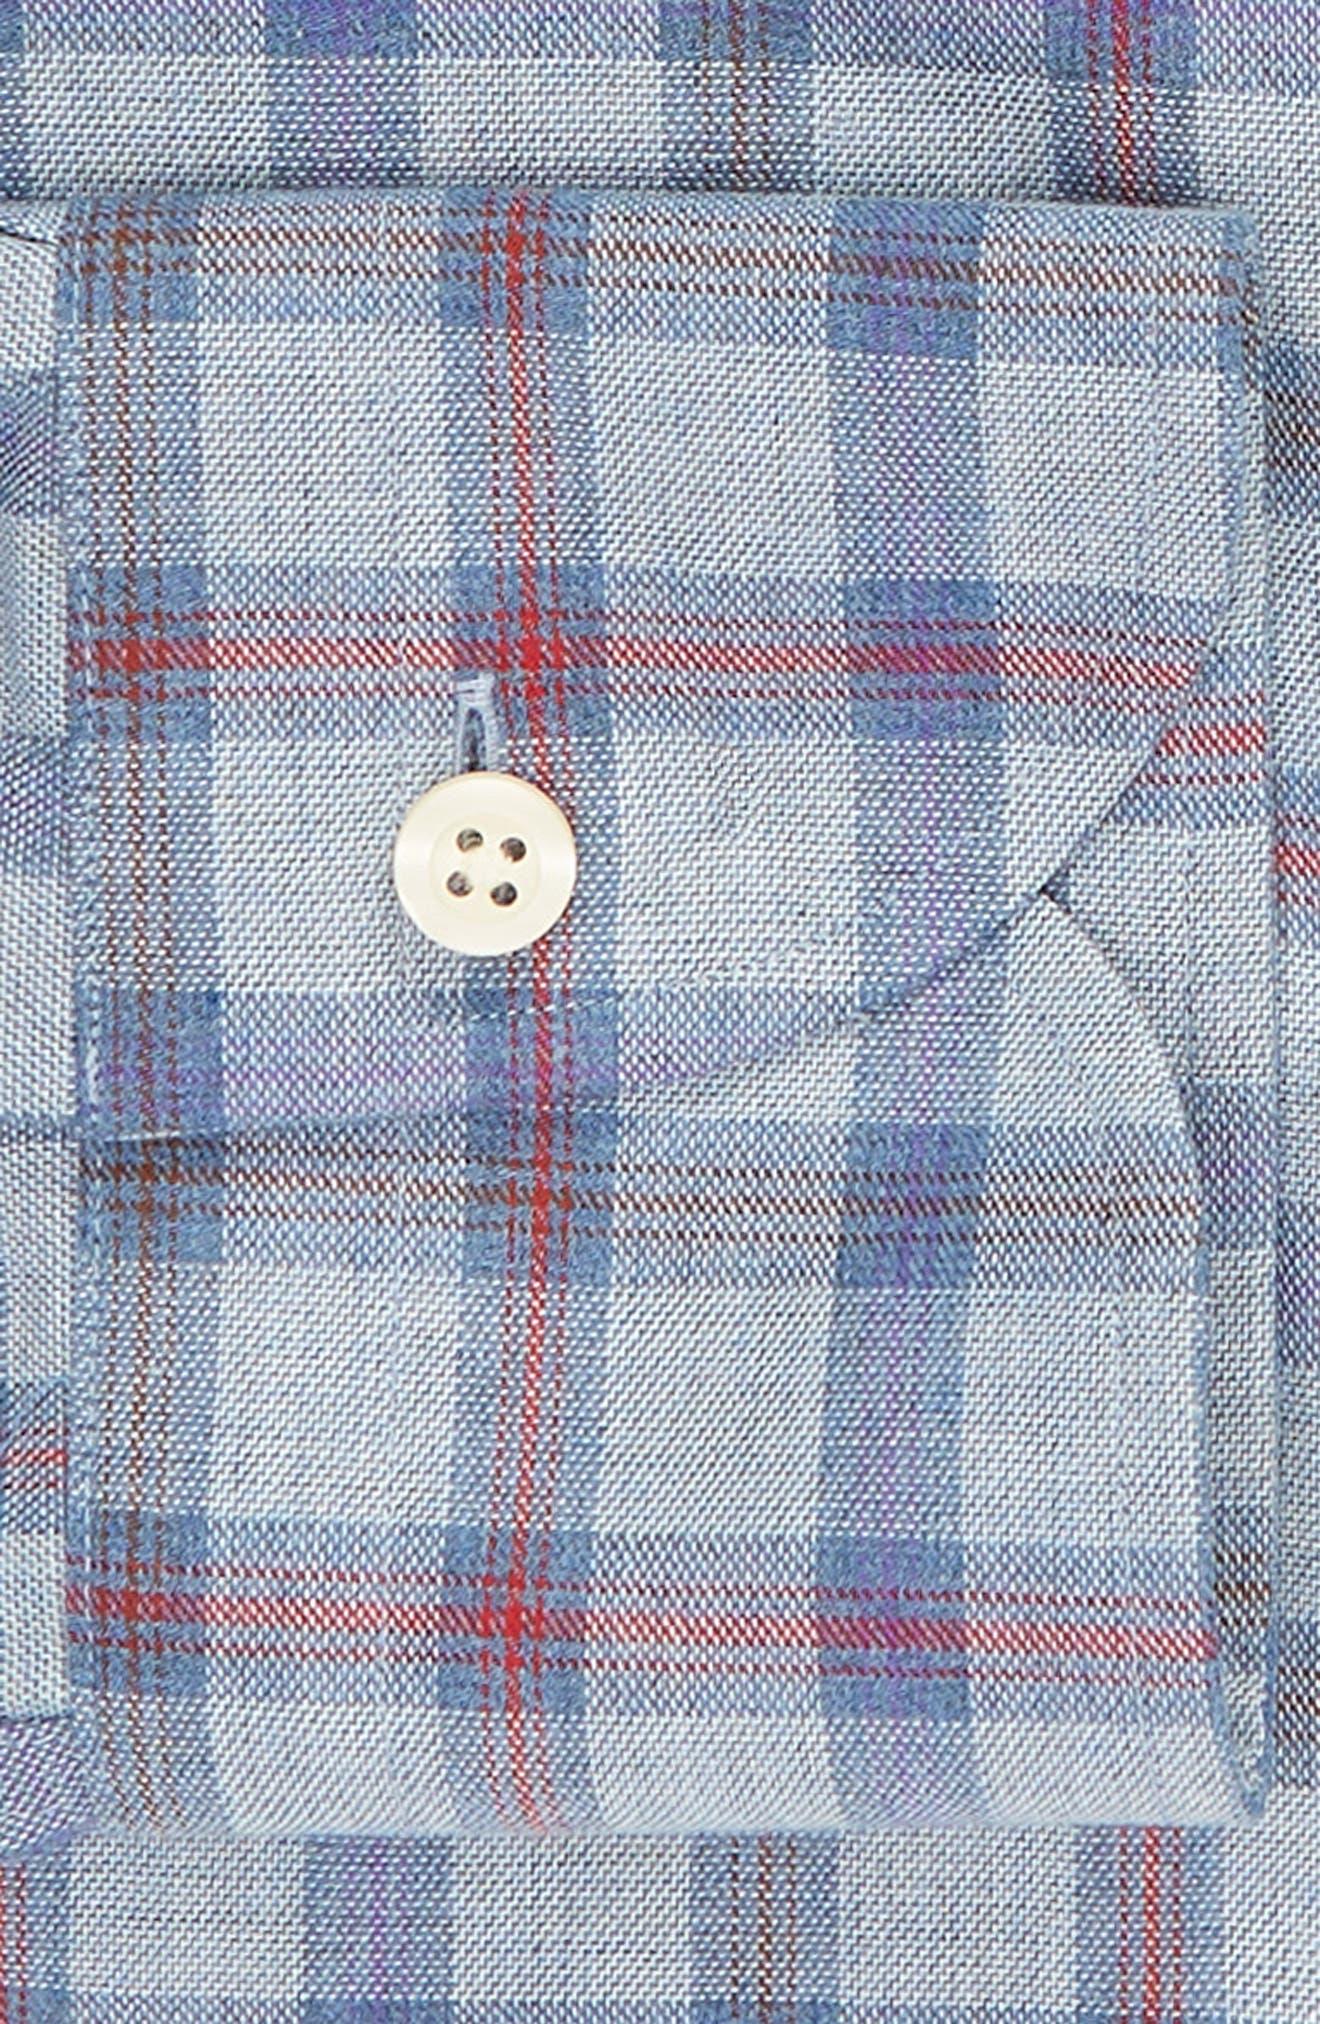 Hilbank Trim Fit Check Dress Shirt,                             Alternate thumbnail 6, color,                             CADET BLUE